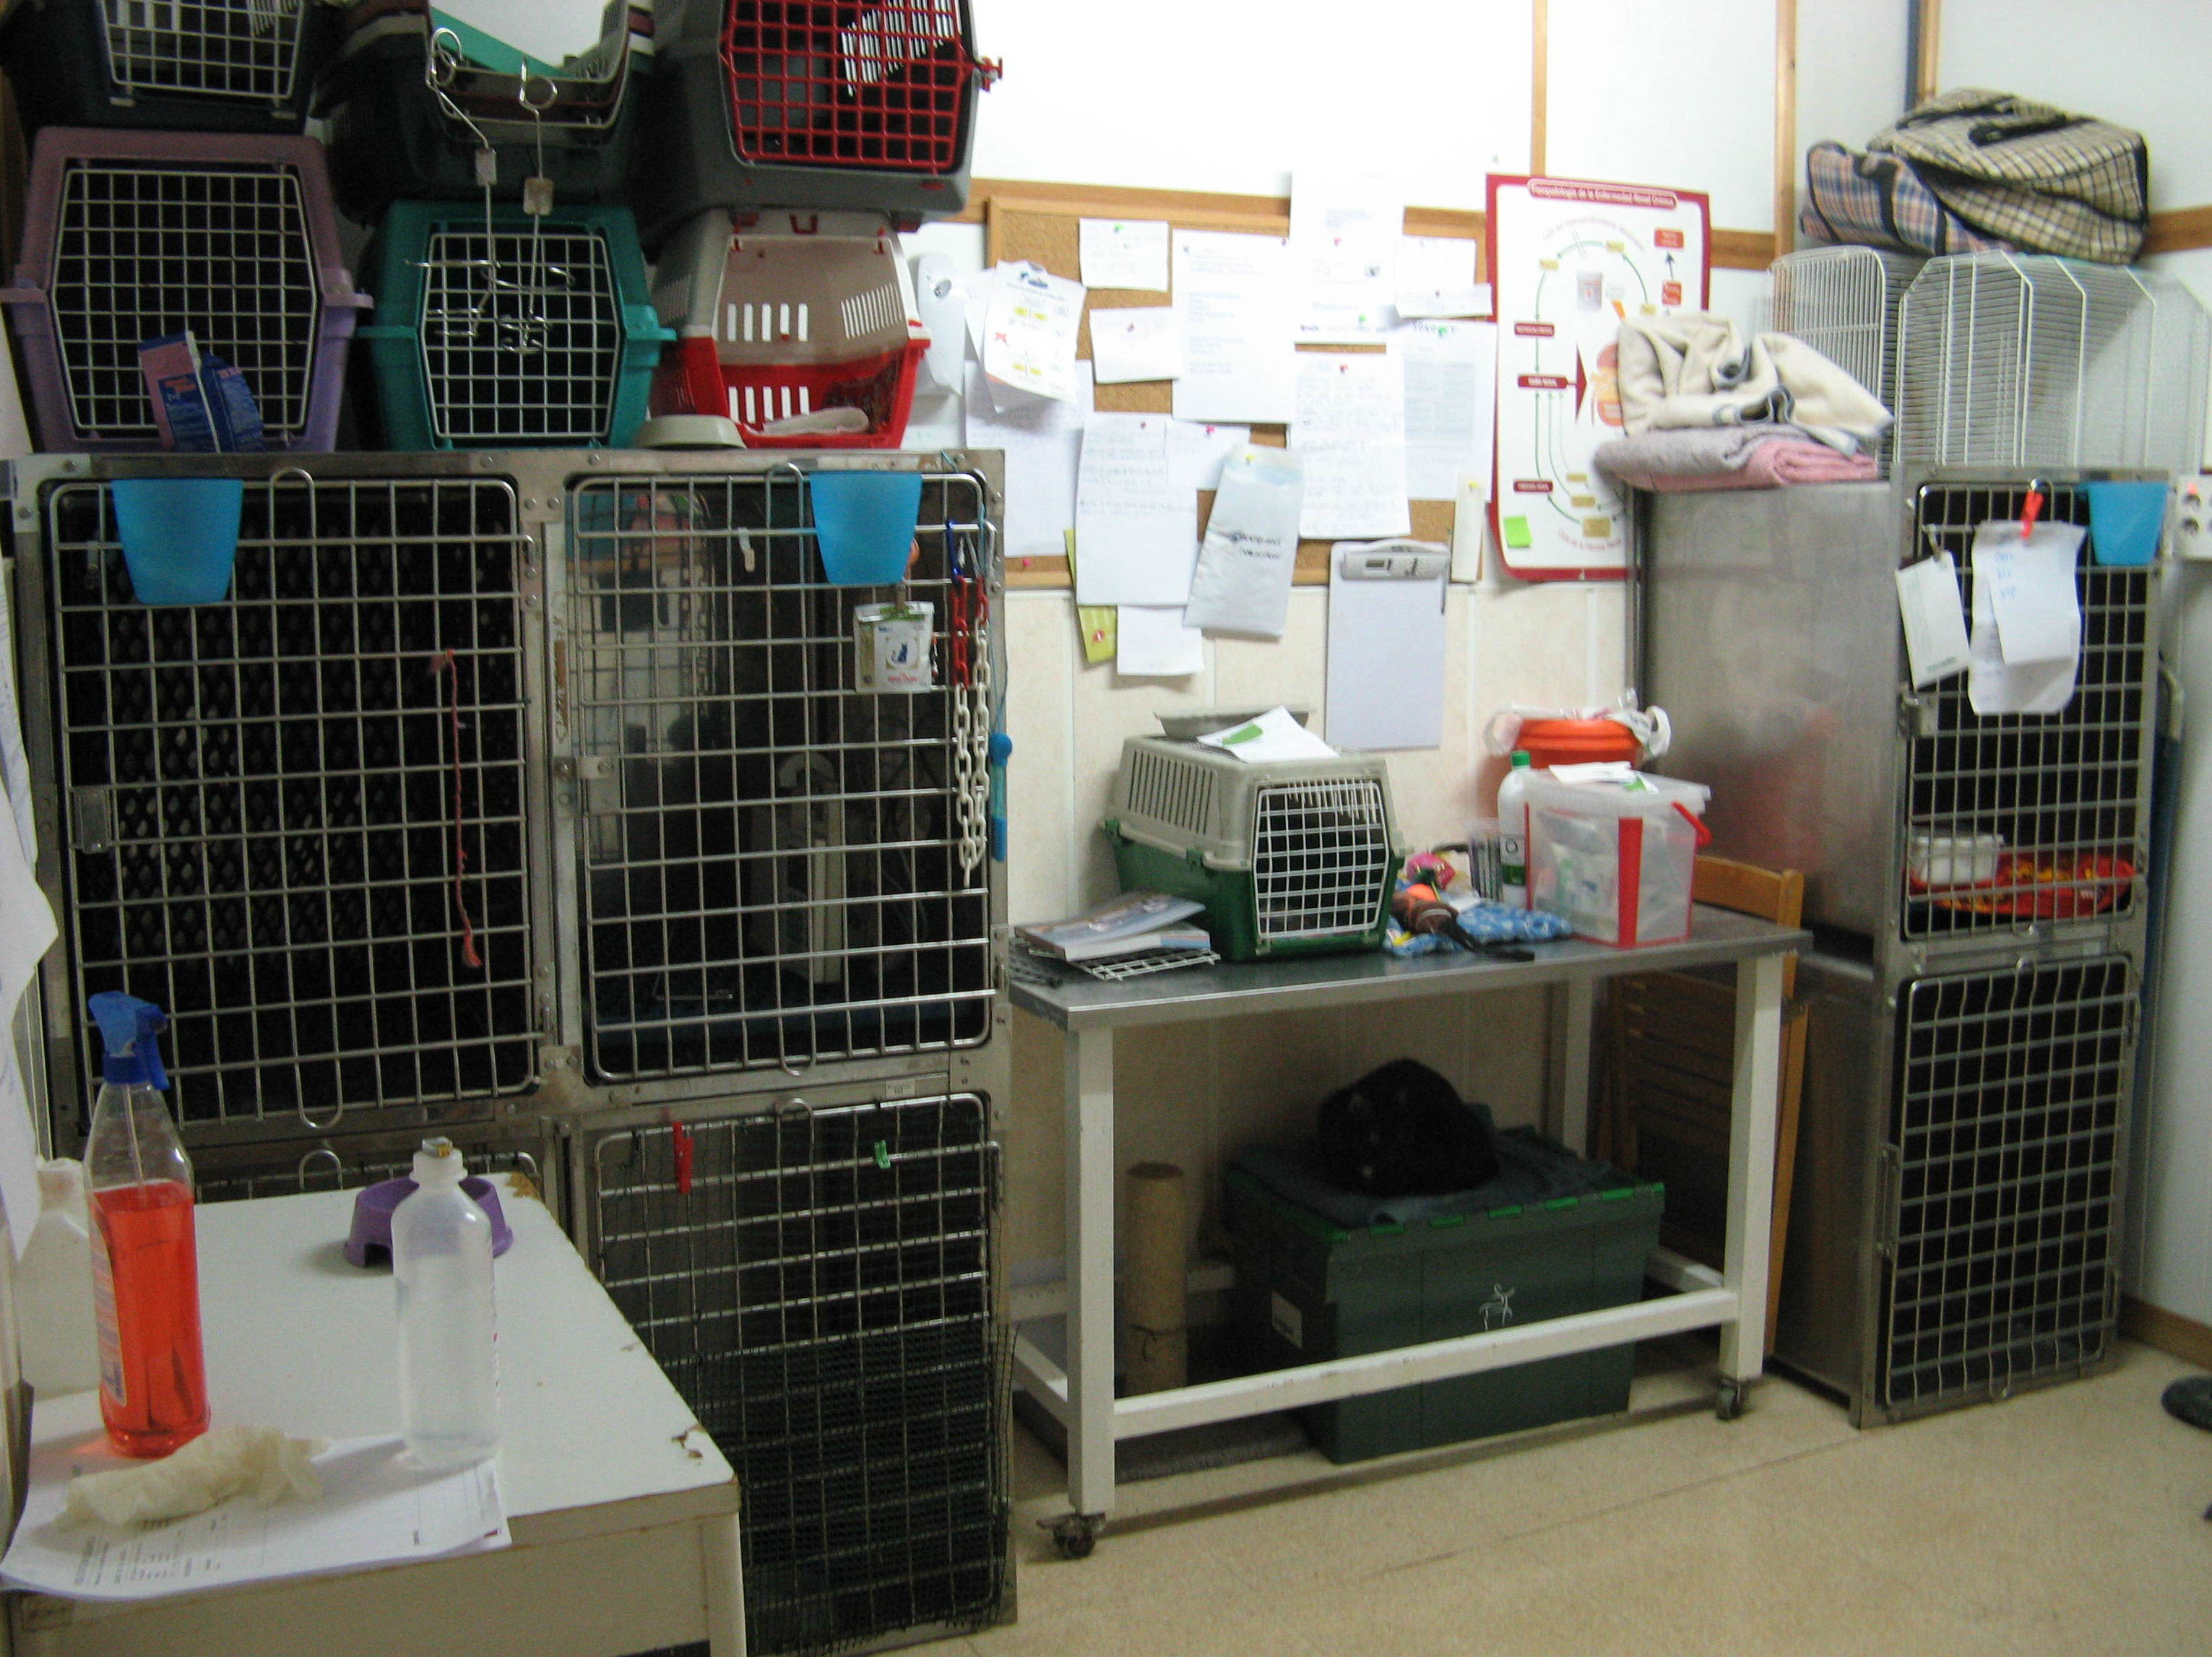 Foto 9 de Clínica veterinaria en Sabadell   Gos i Gat clínica veterinària sl